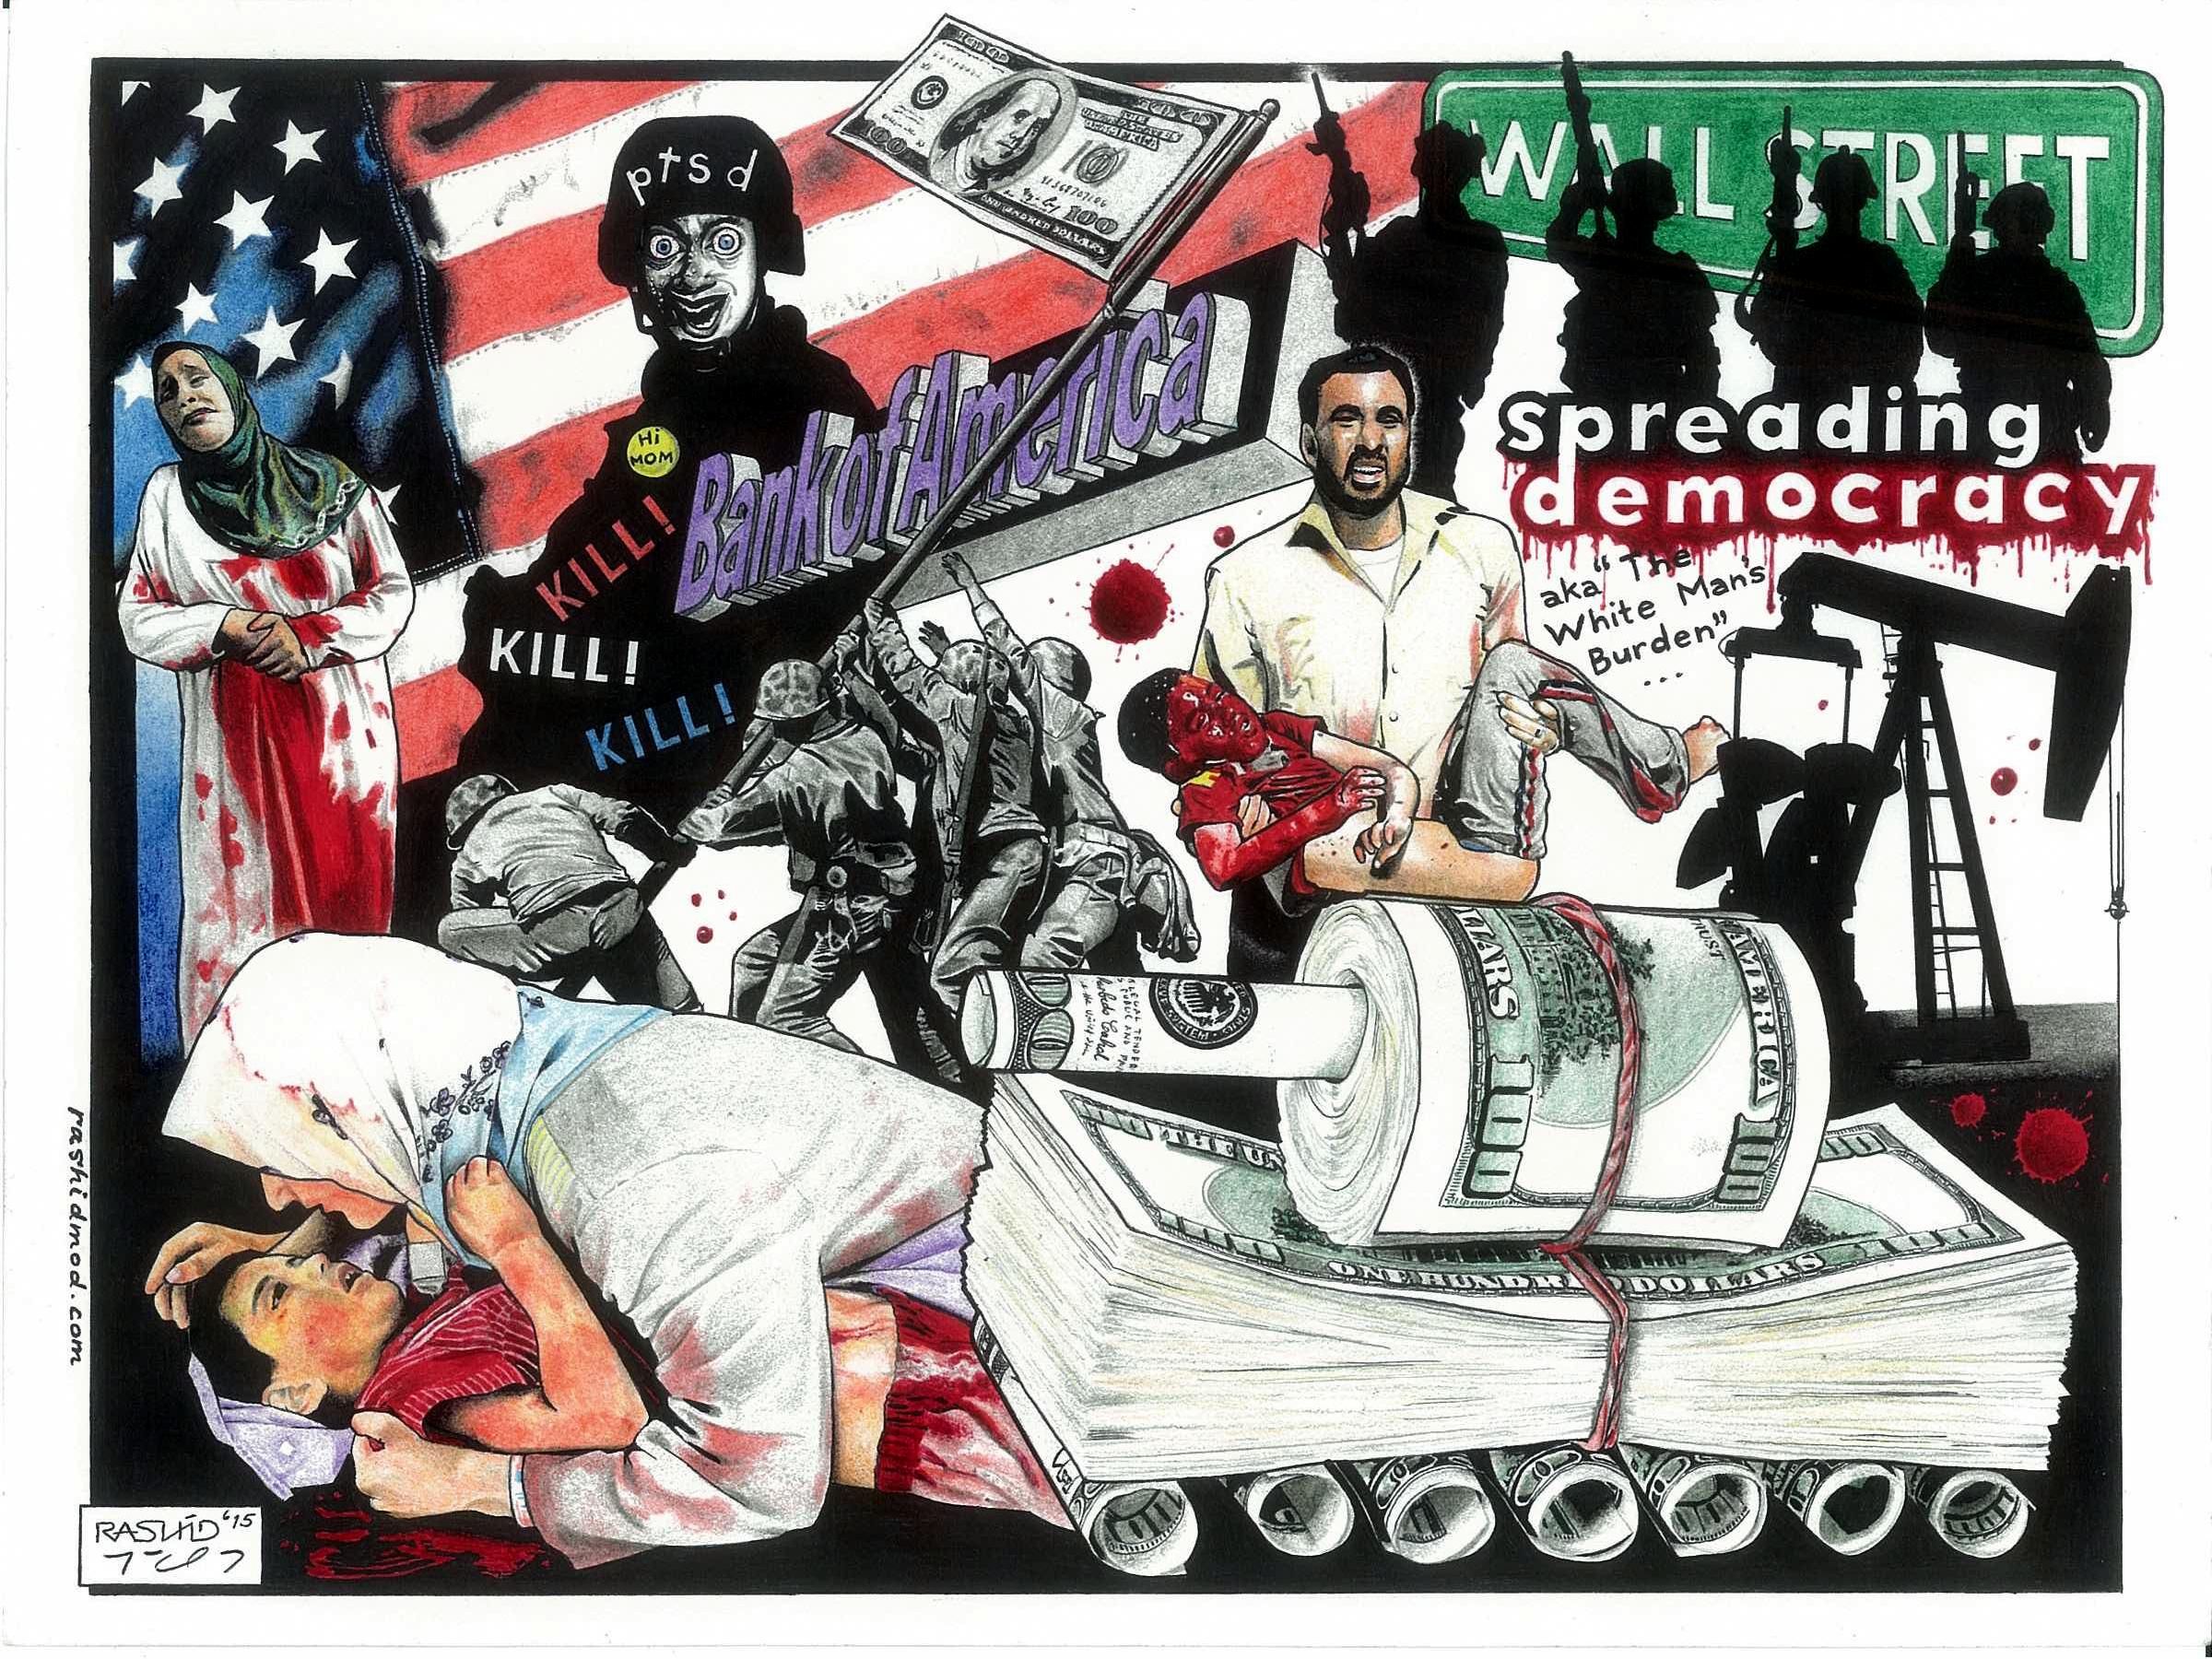 Wars-for-Wall-Street-by-Rashid